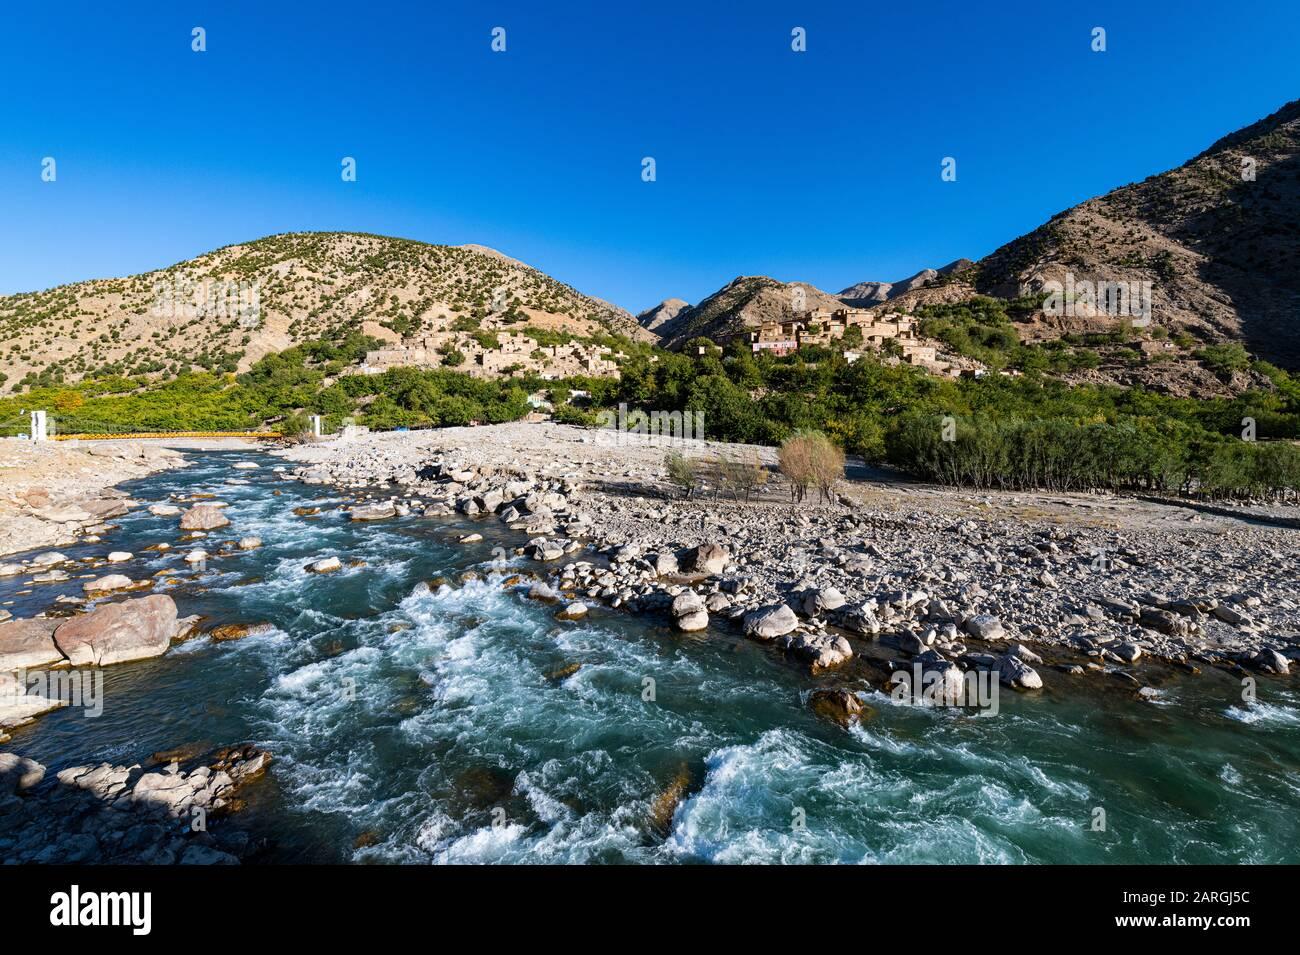 Río Panjshir que fluye a través del Valle Panjshir, Afganistán, Asia Foto de stock